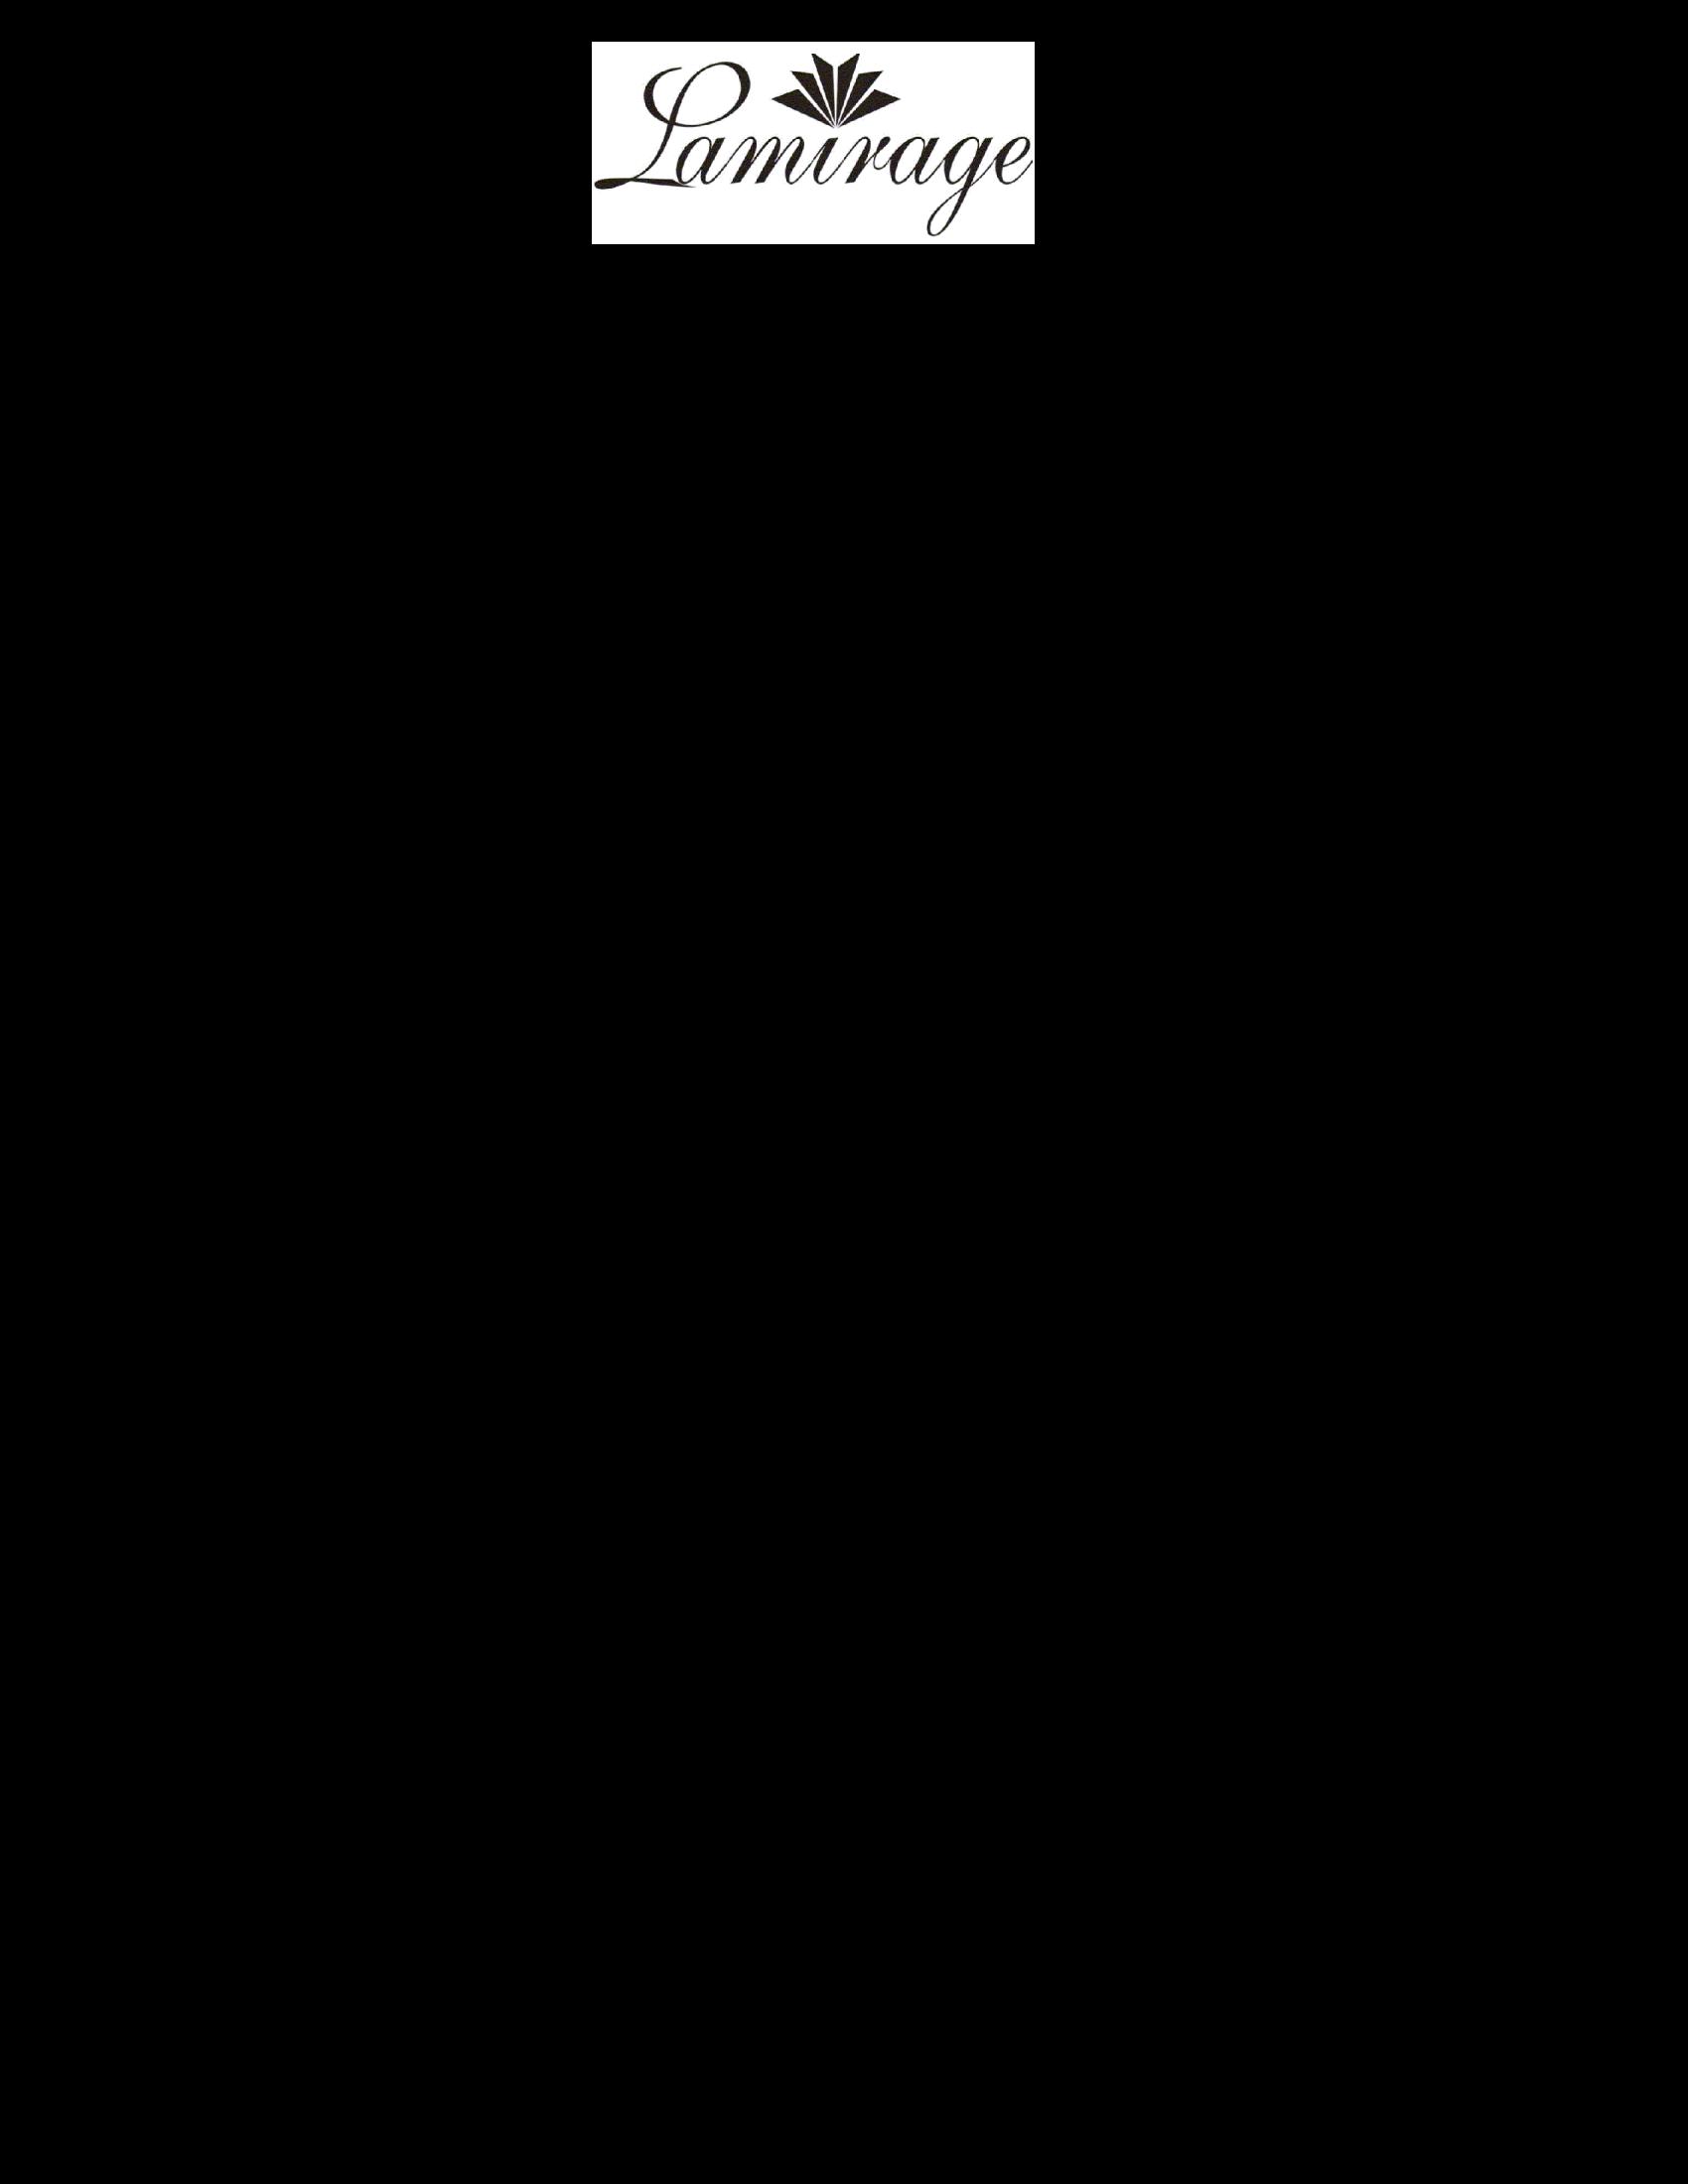 P1dsb64mcd1fukkika3716kshve4-0